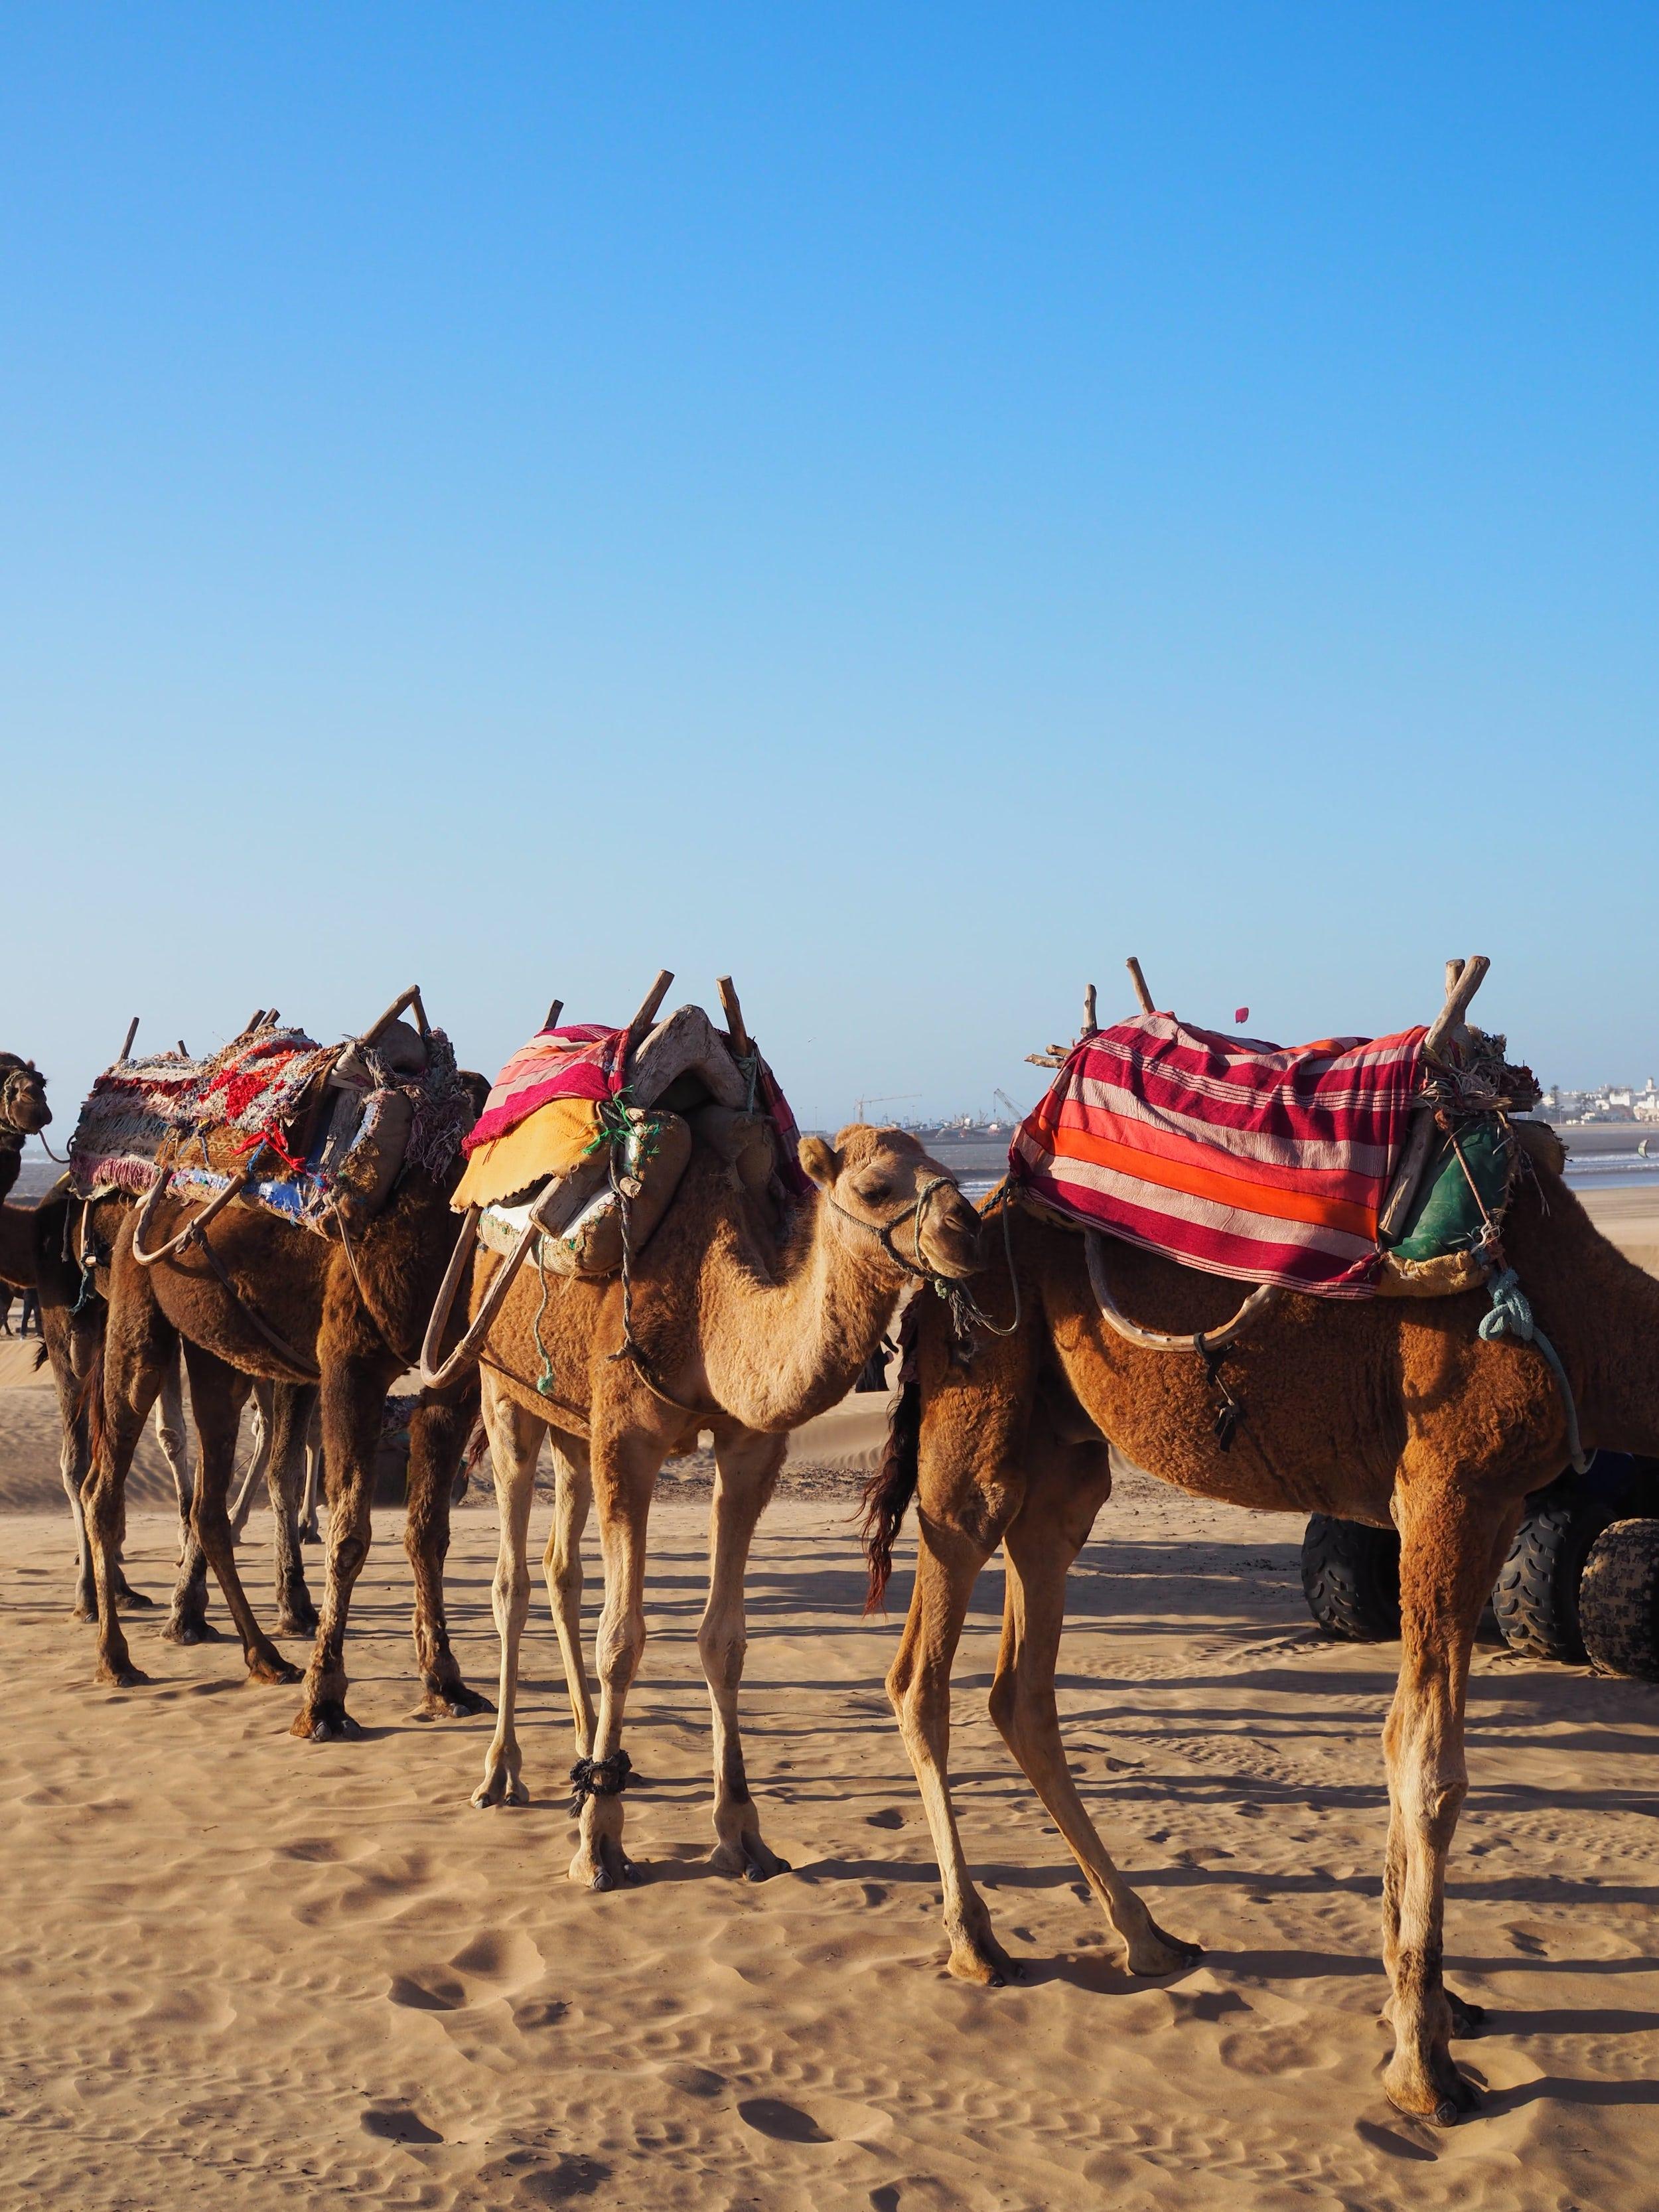 randonnée-chameaux-essaouira